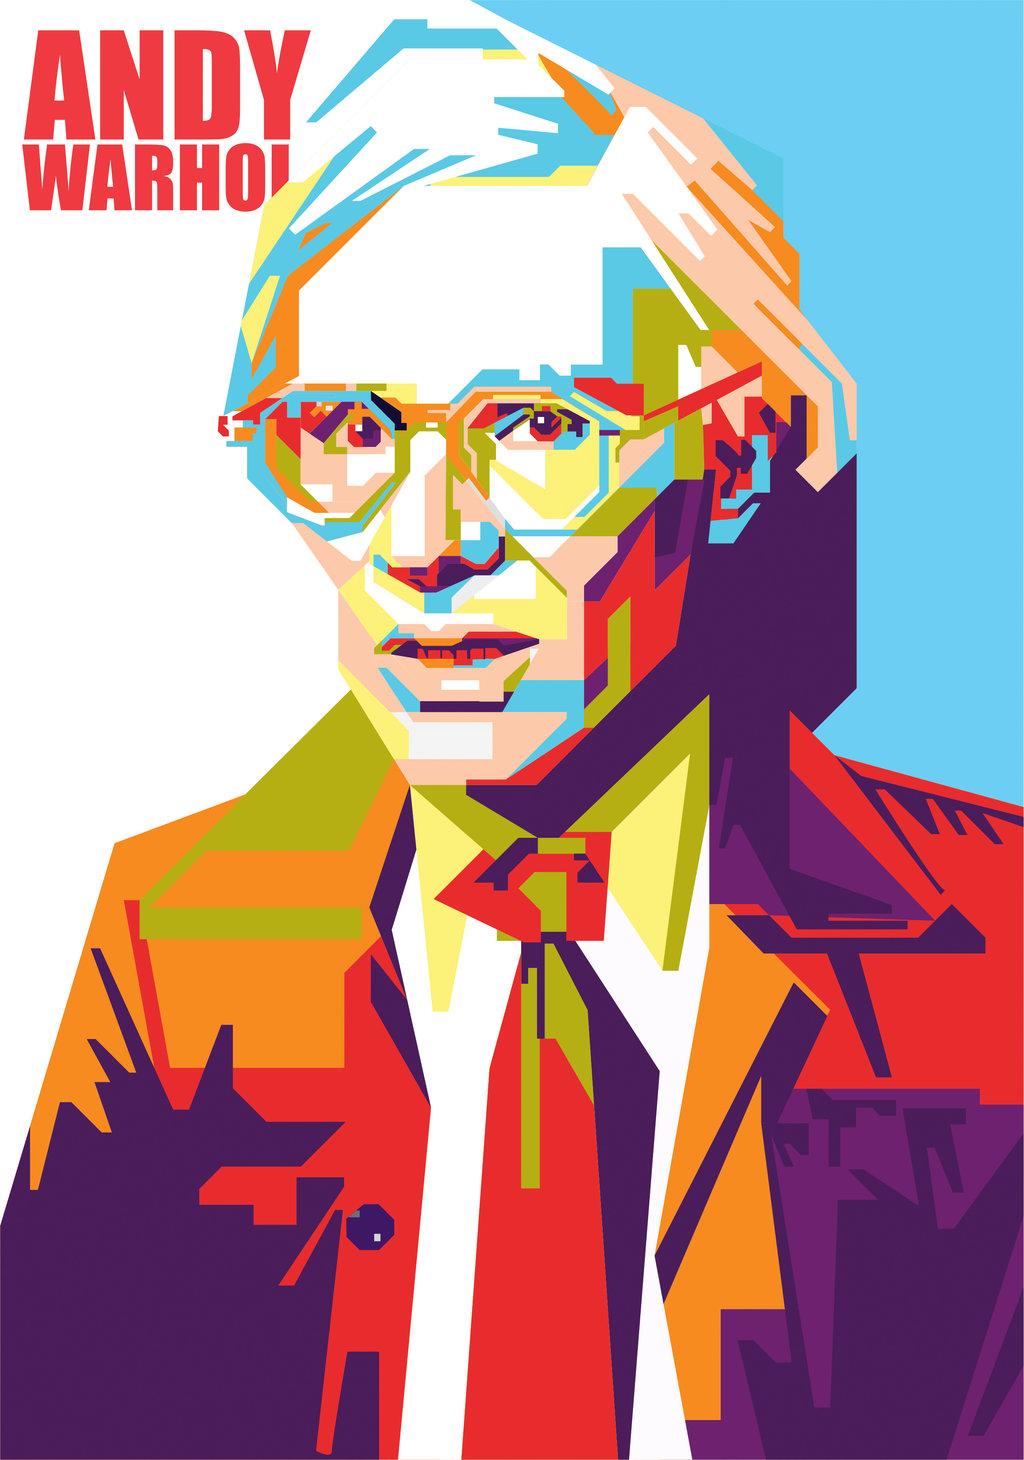 Andy Warhol Timeline Andy warhol bodley gallery